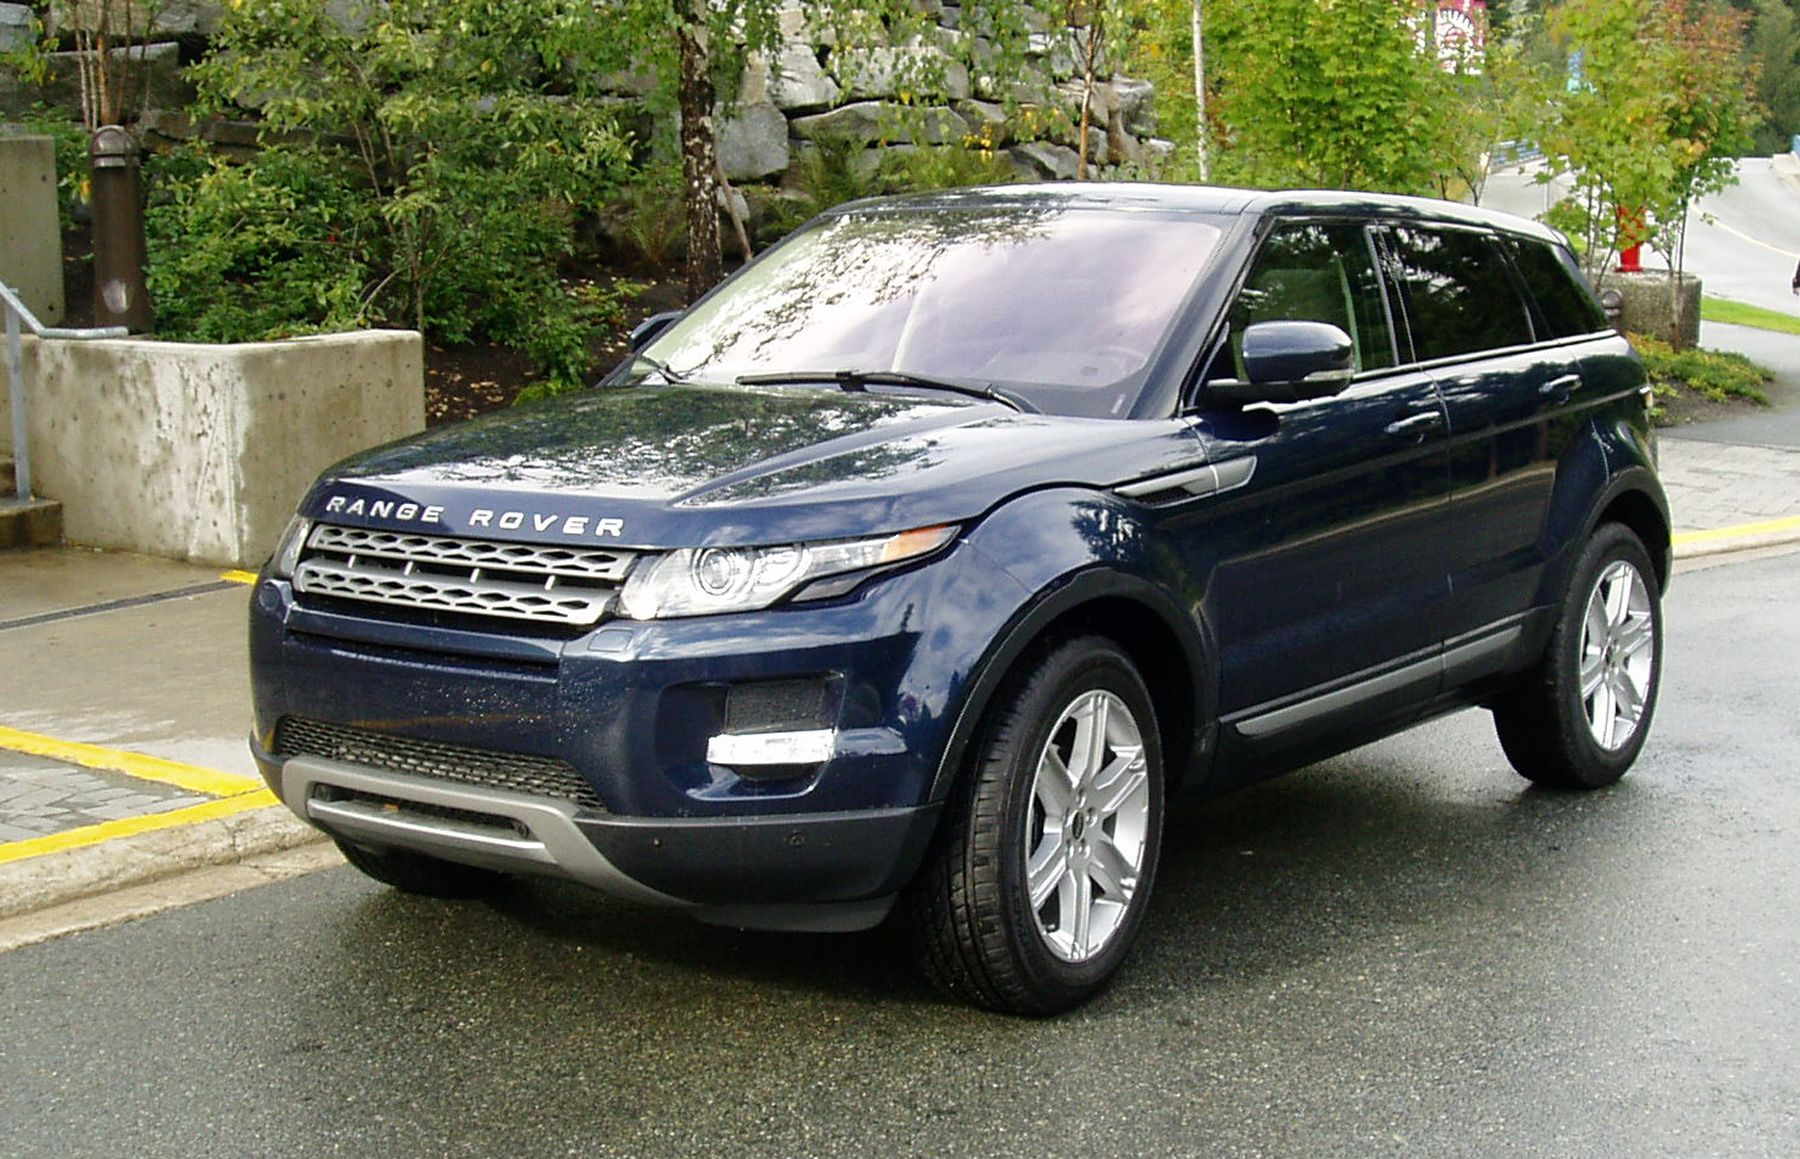 Range Rover Evoque In Baltic Blue